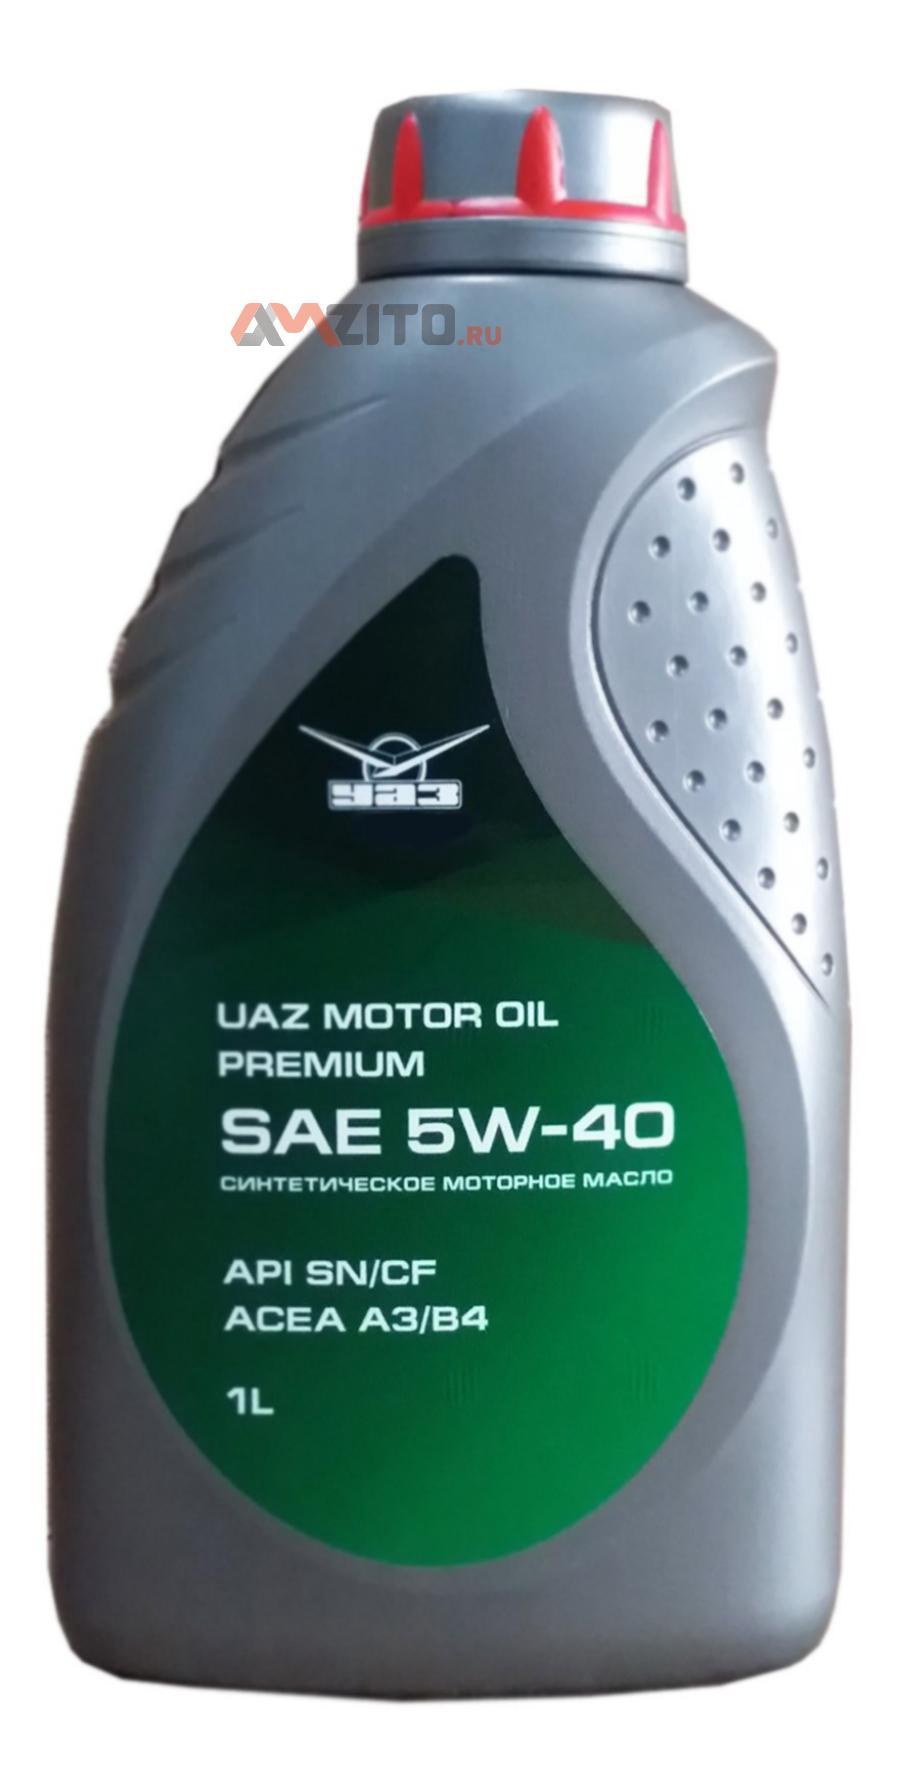 Масло моторное синтетическое Motor Oil Premium 5W-40, 1л